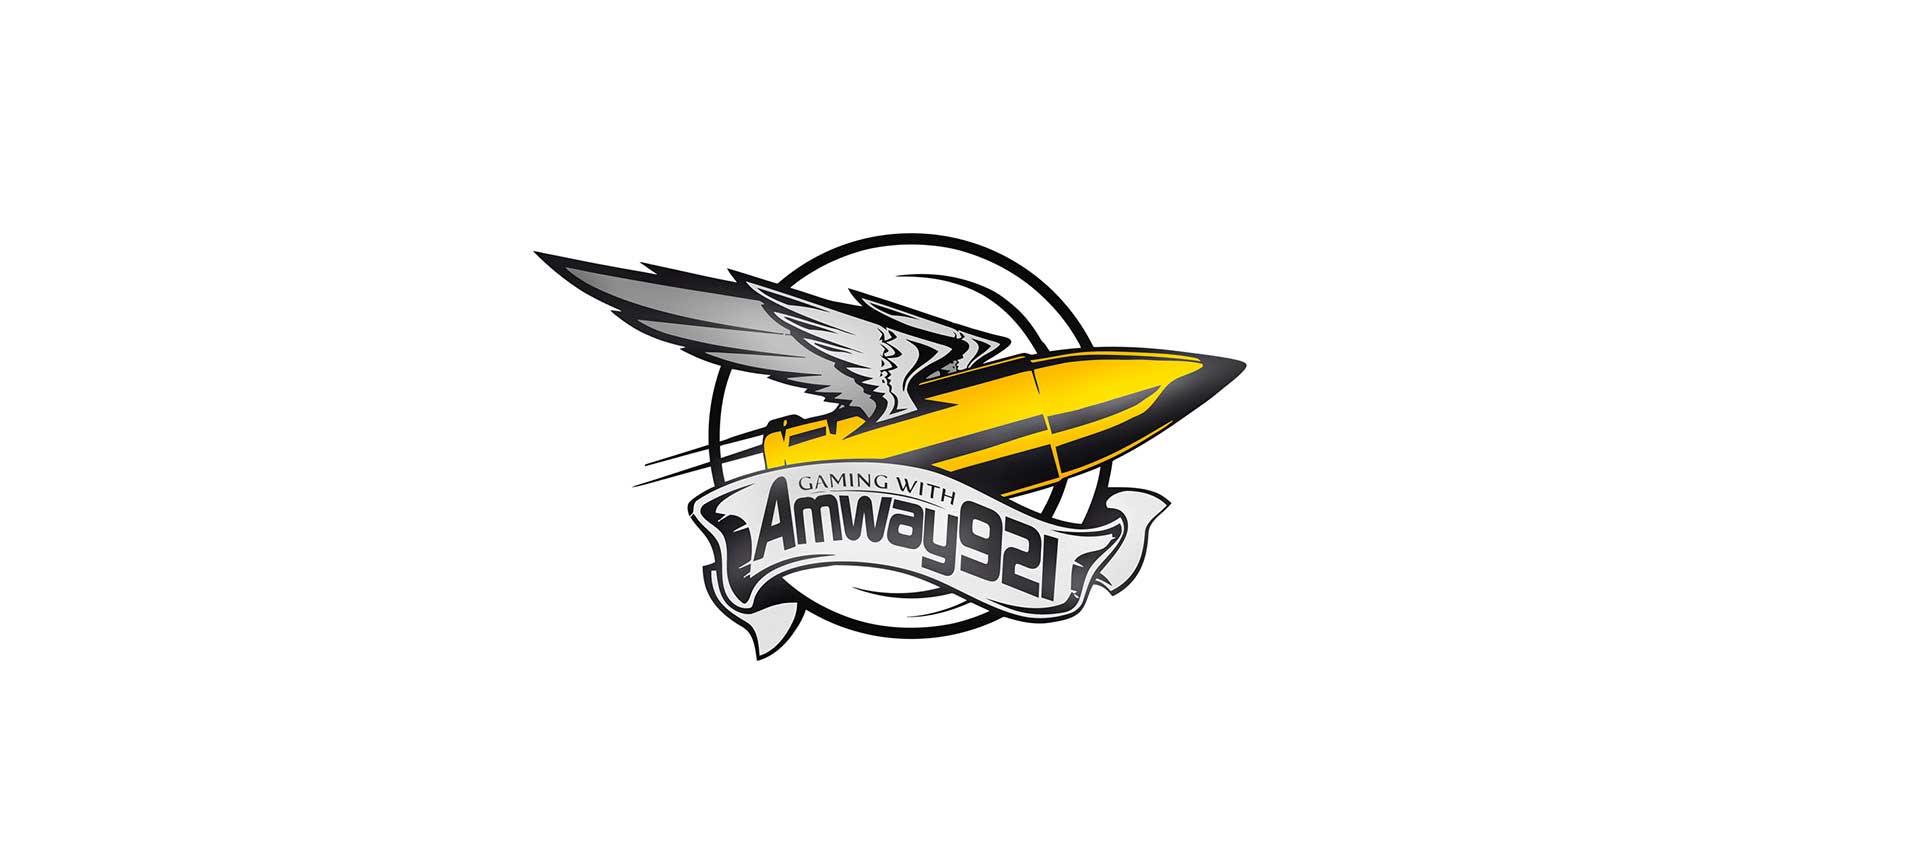 amway921